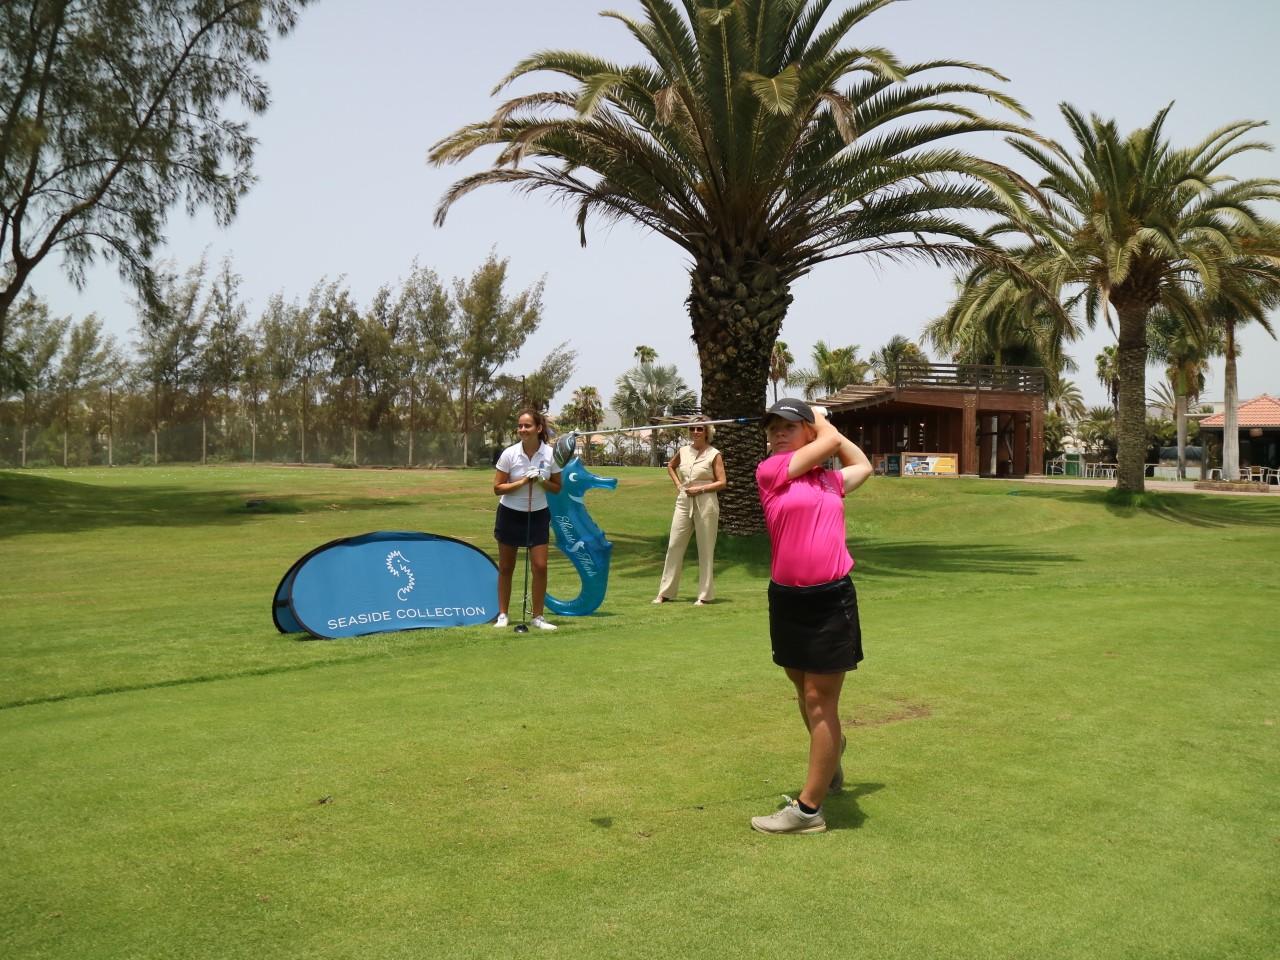 XVIII Torneo Benéfico San Juan de Dios, Open Seaside Collection, Maspalomas Golf / canariasnoticias